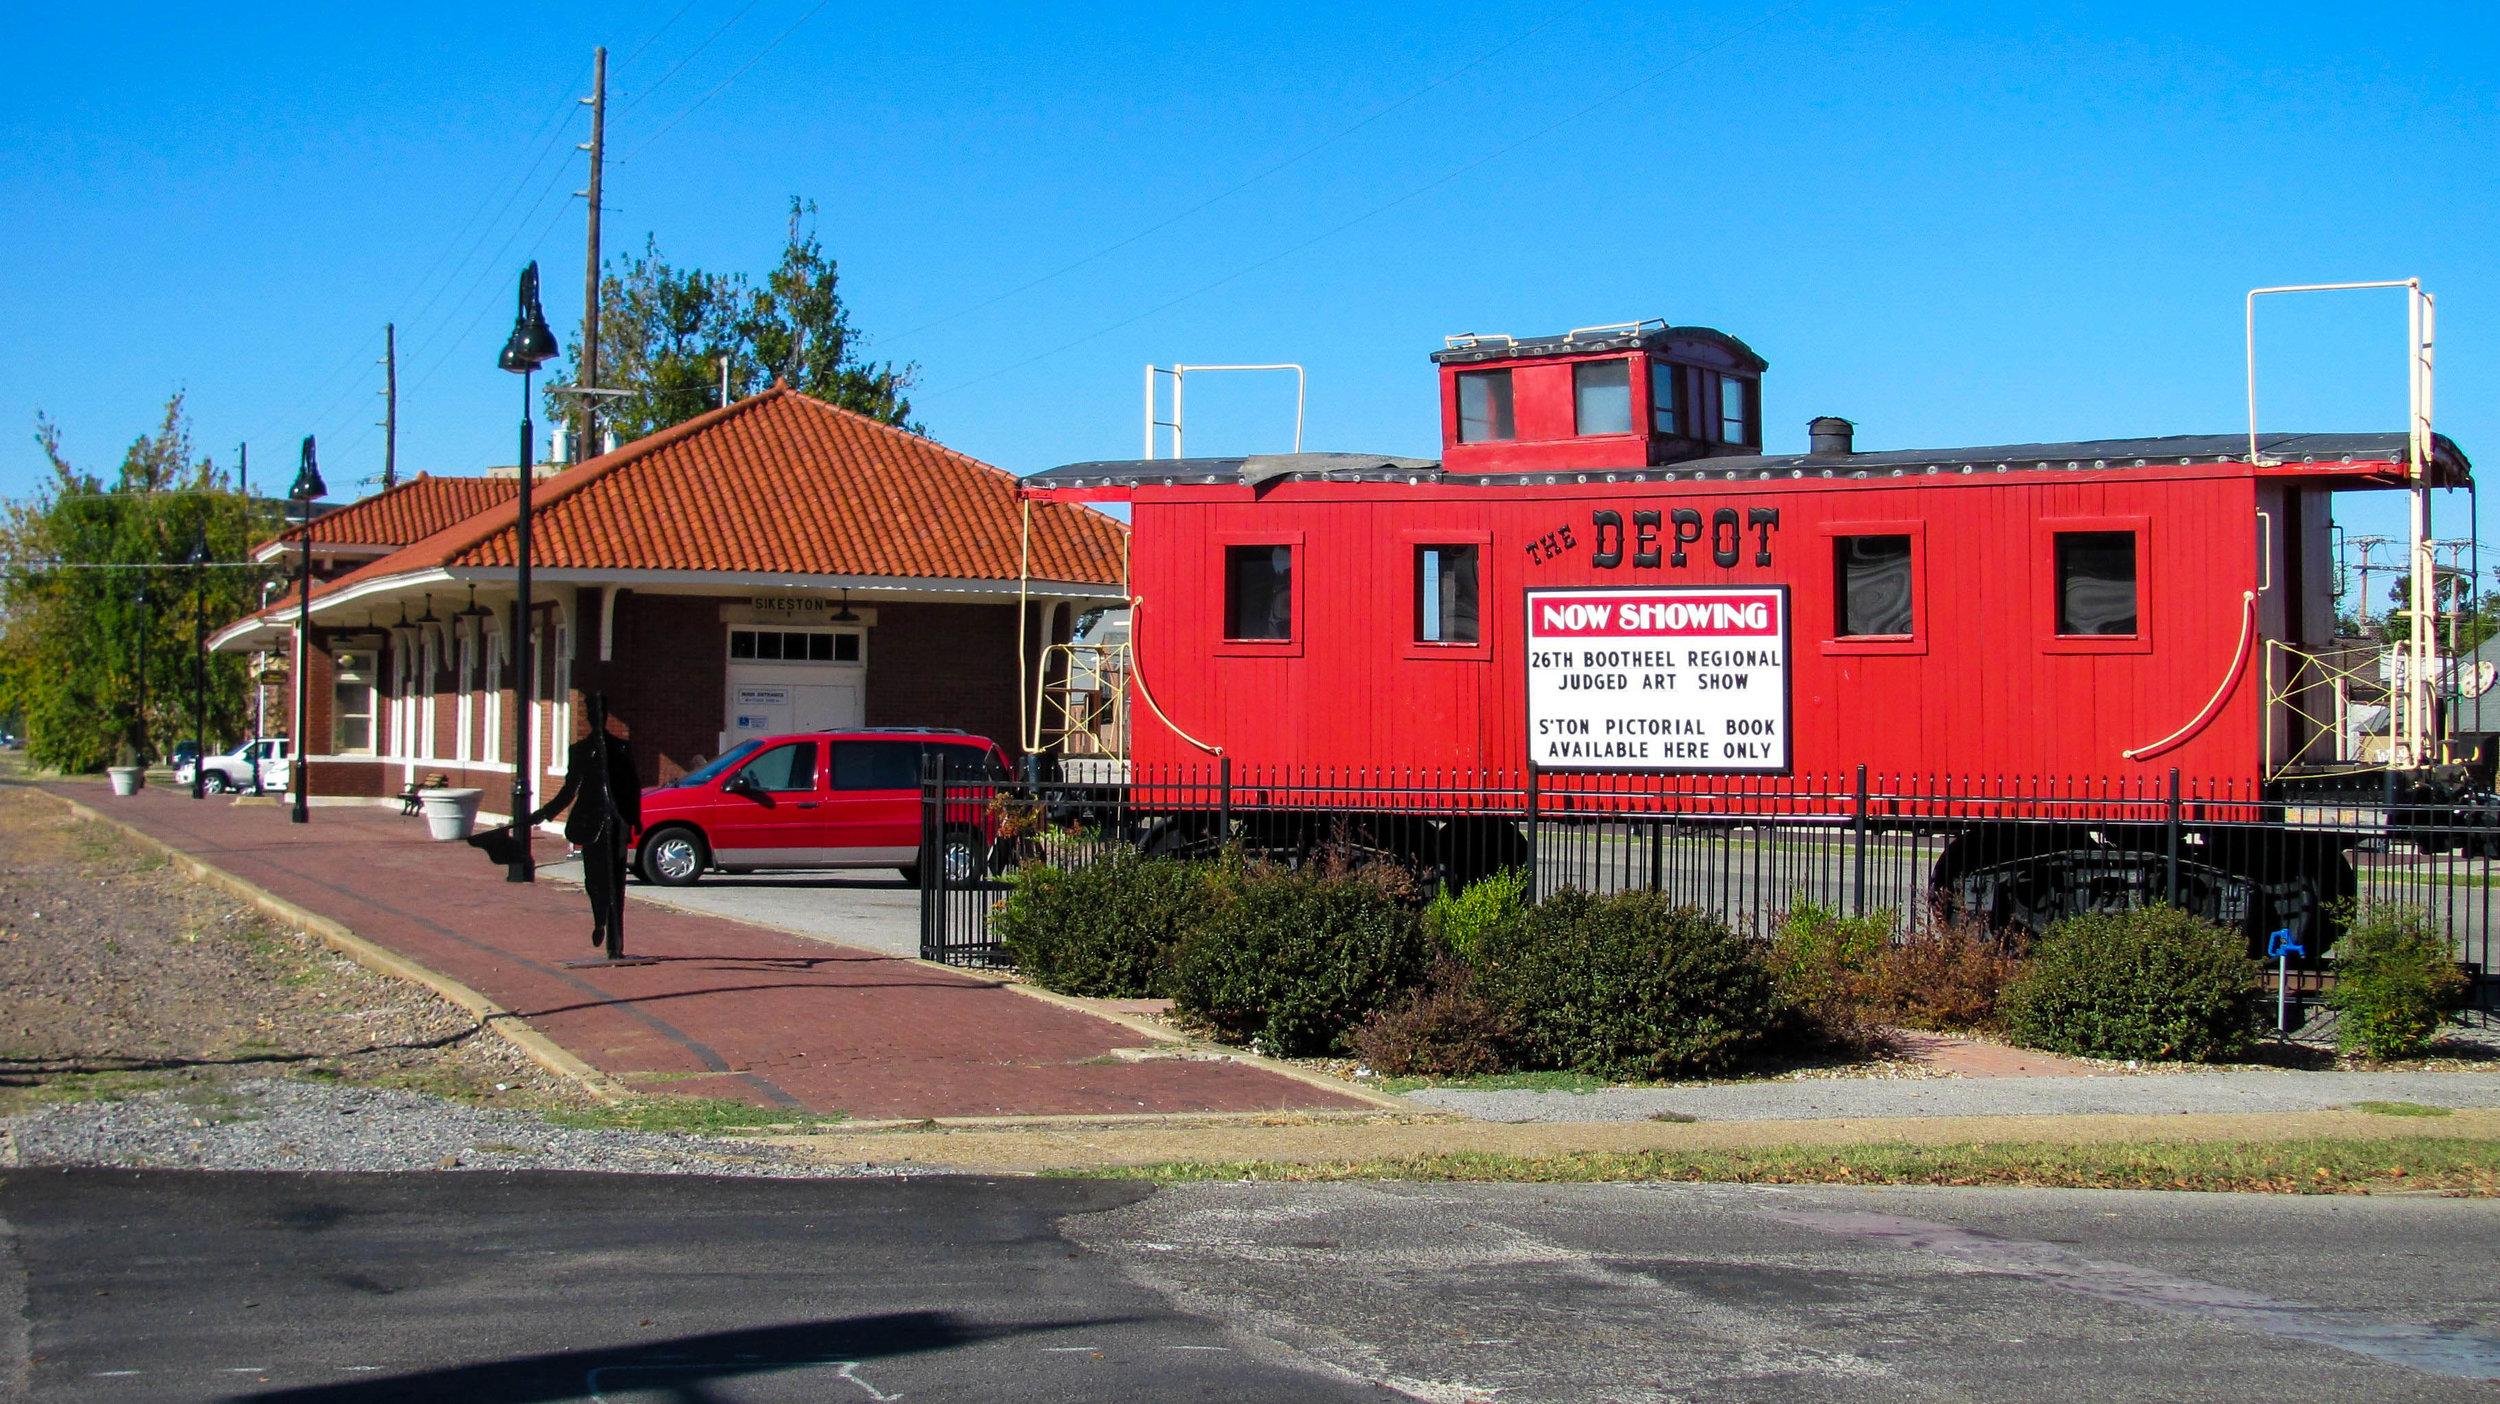 sikeston-depot-10142010-alr-0335.jpg